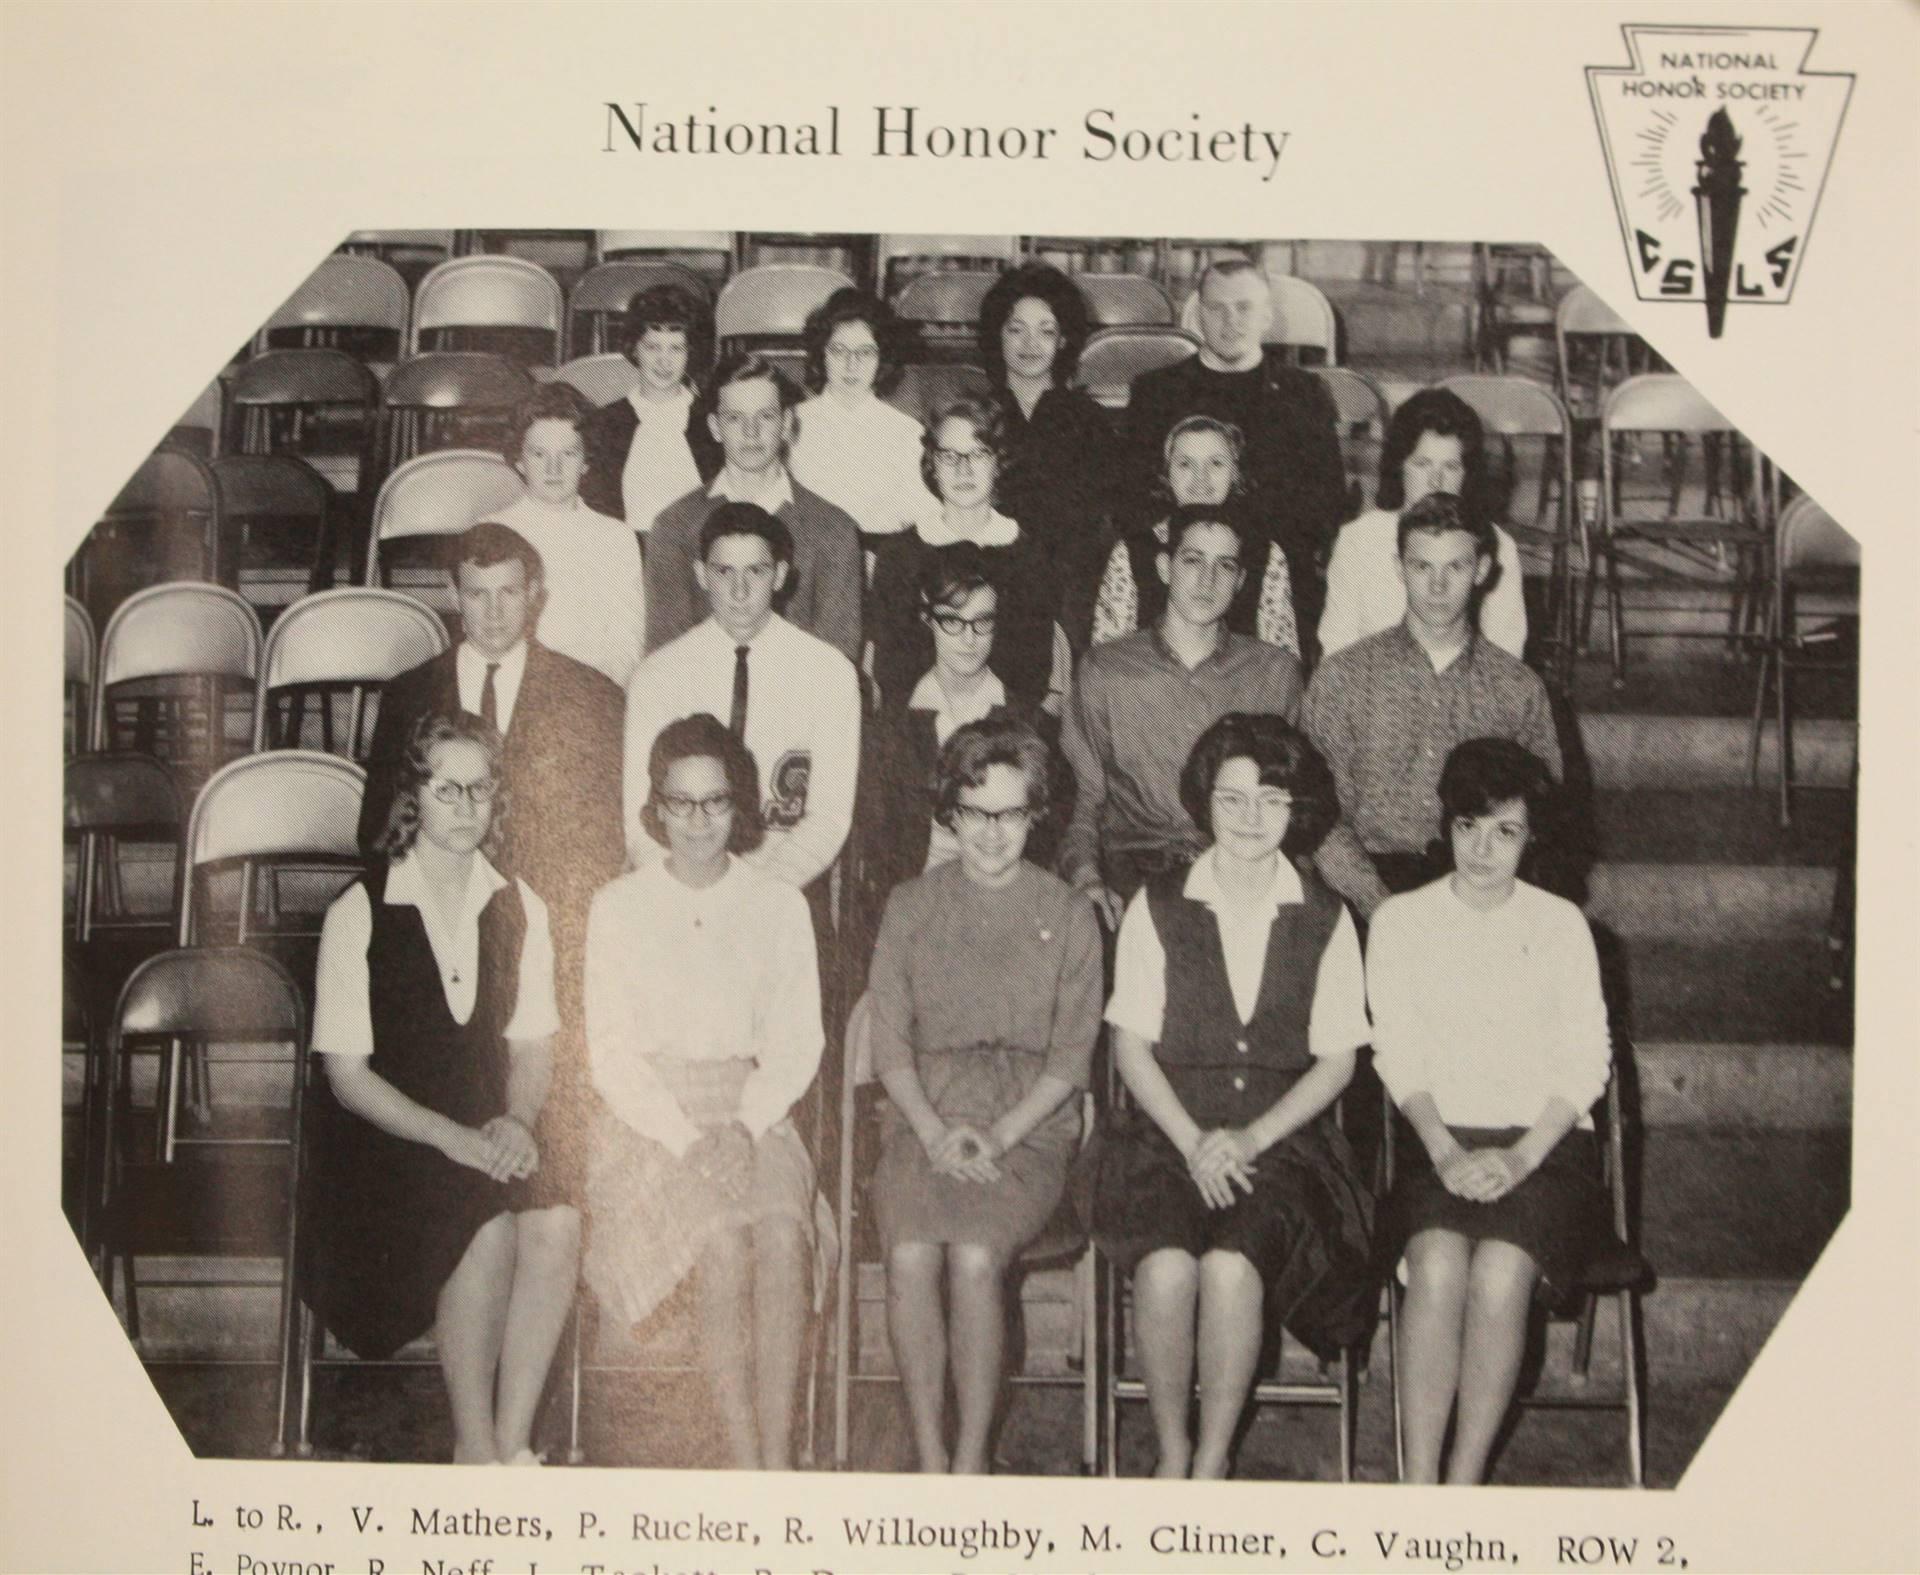 1965 national honor society